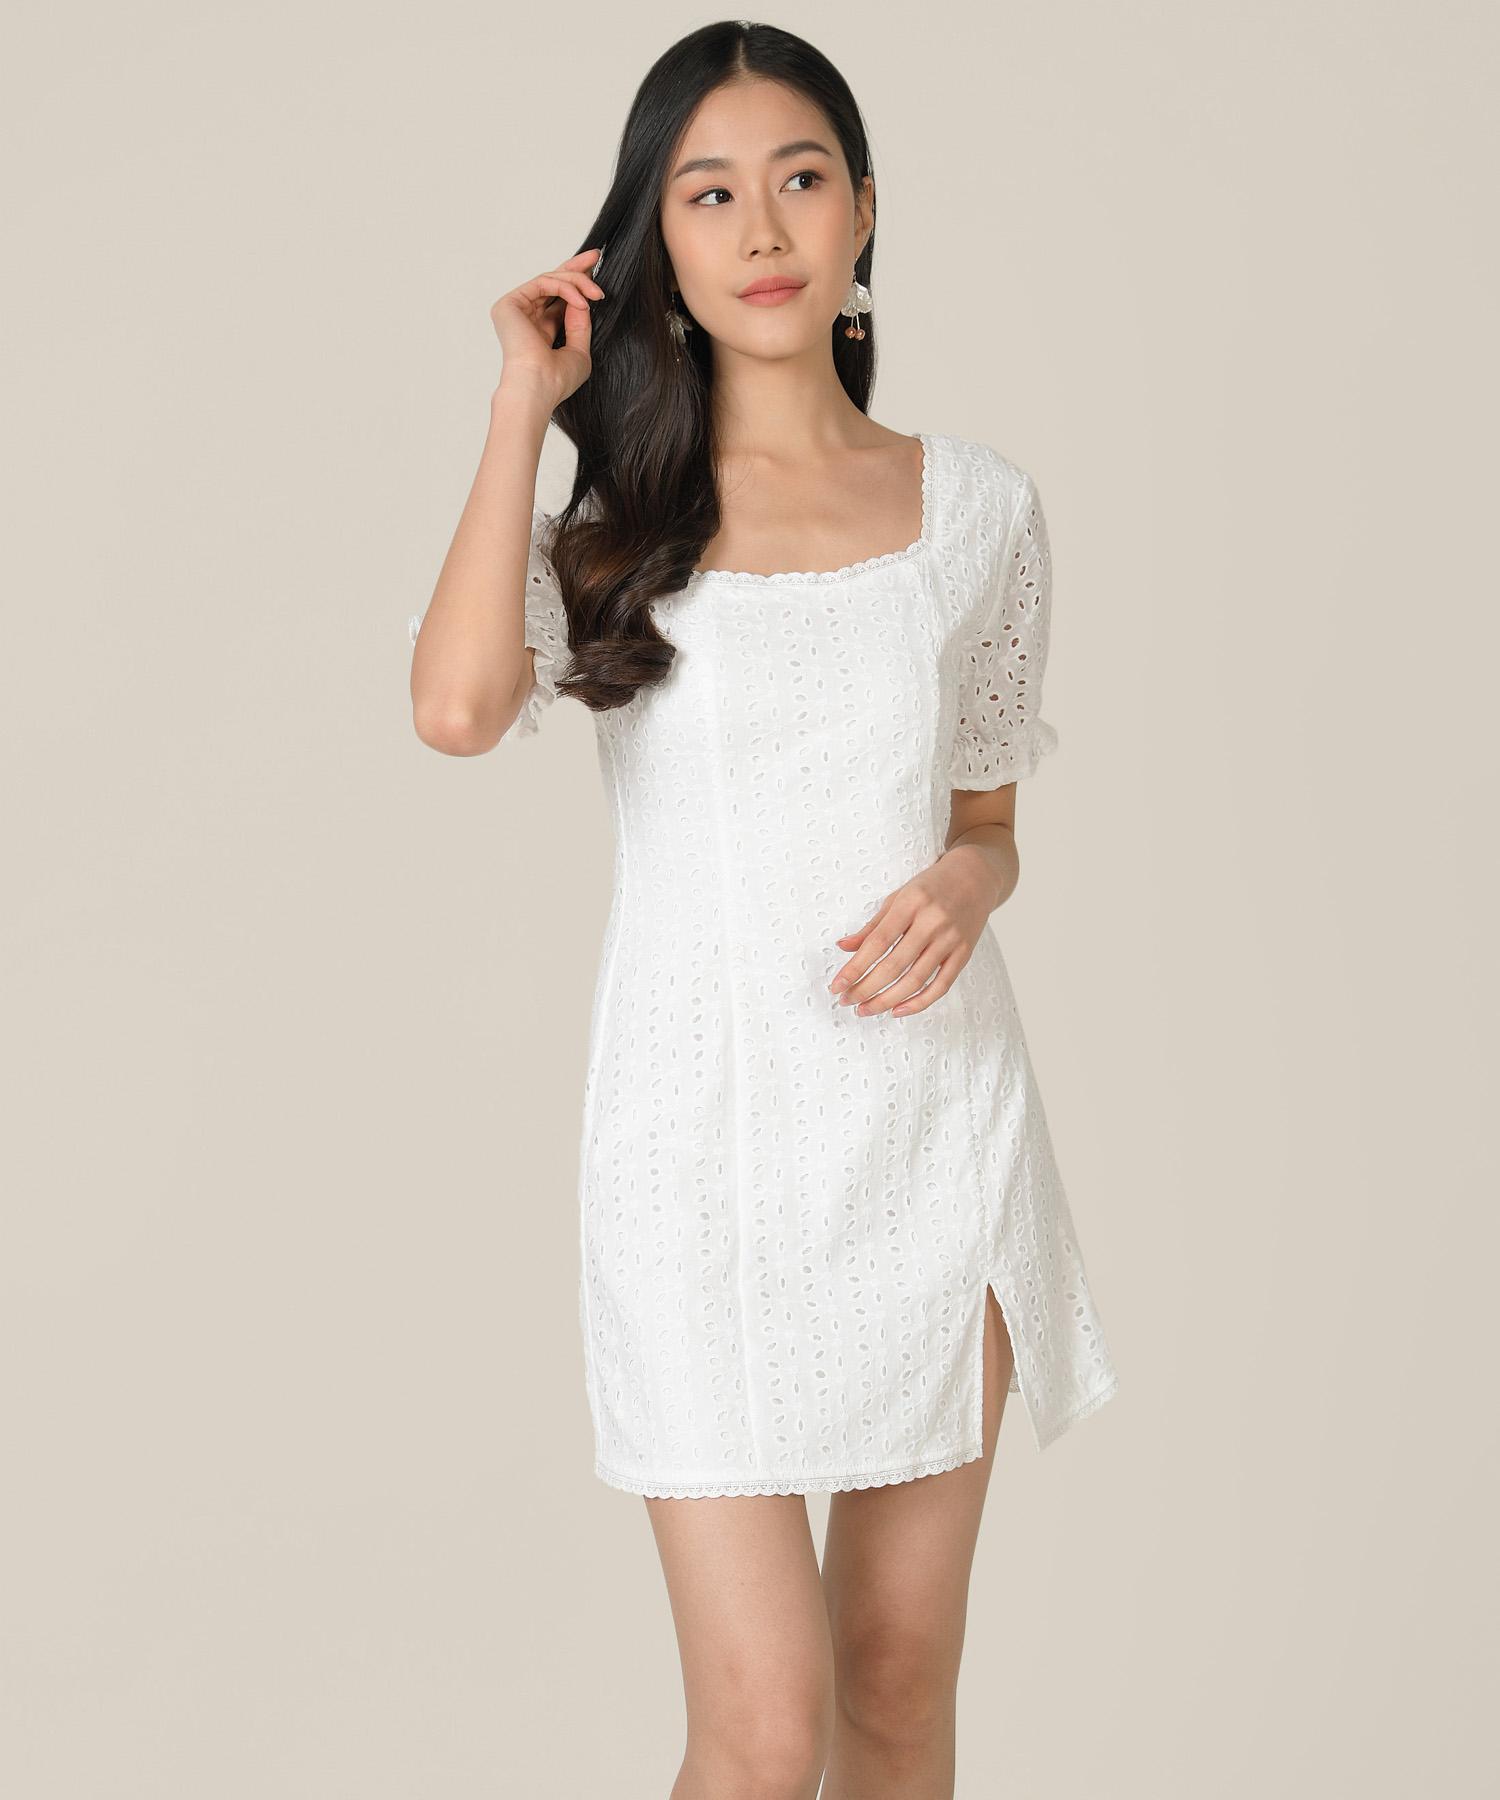 vianna-eyelet-pouf-sleeved-dress-white-1